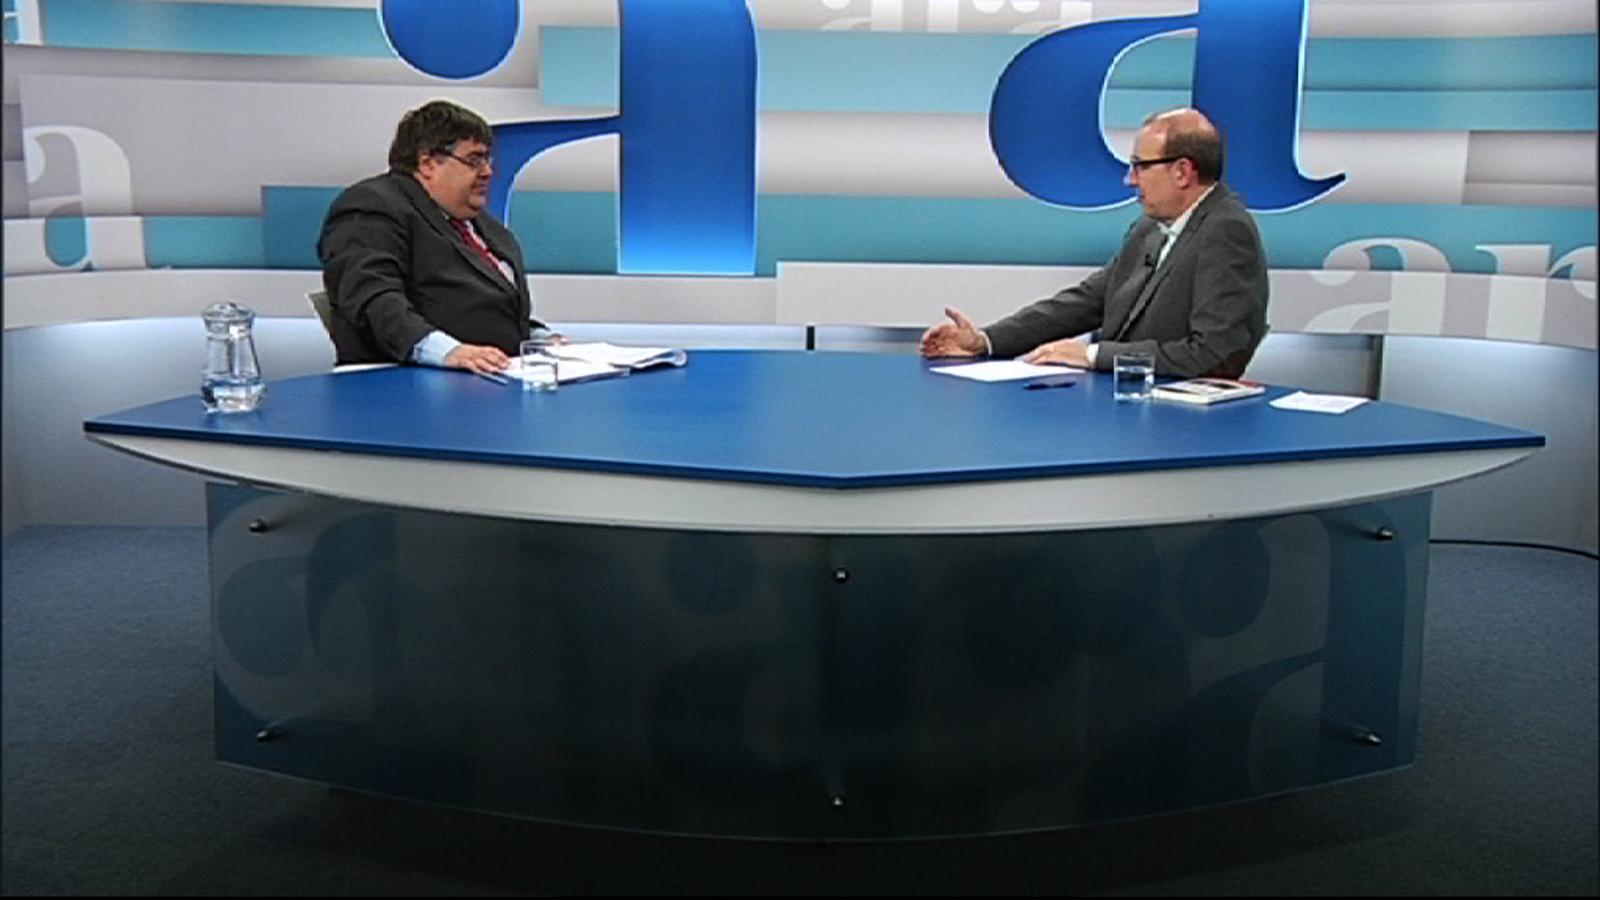 Entrevista d'Antoni Bassas a Xavier Melgarejo, per 'Ara TV Premium'